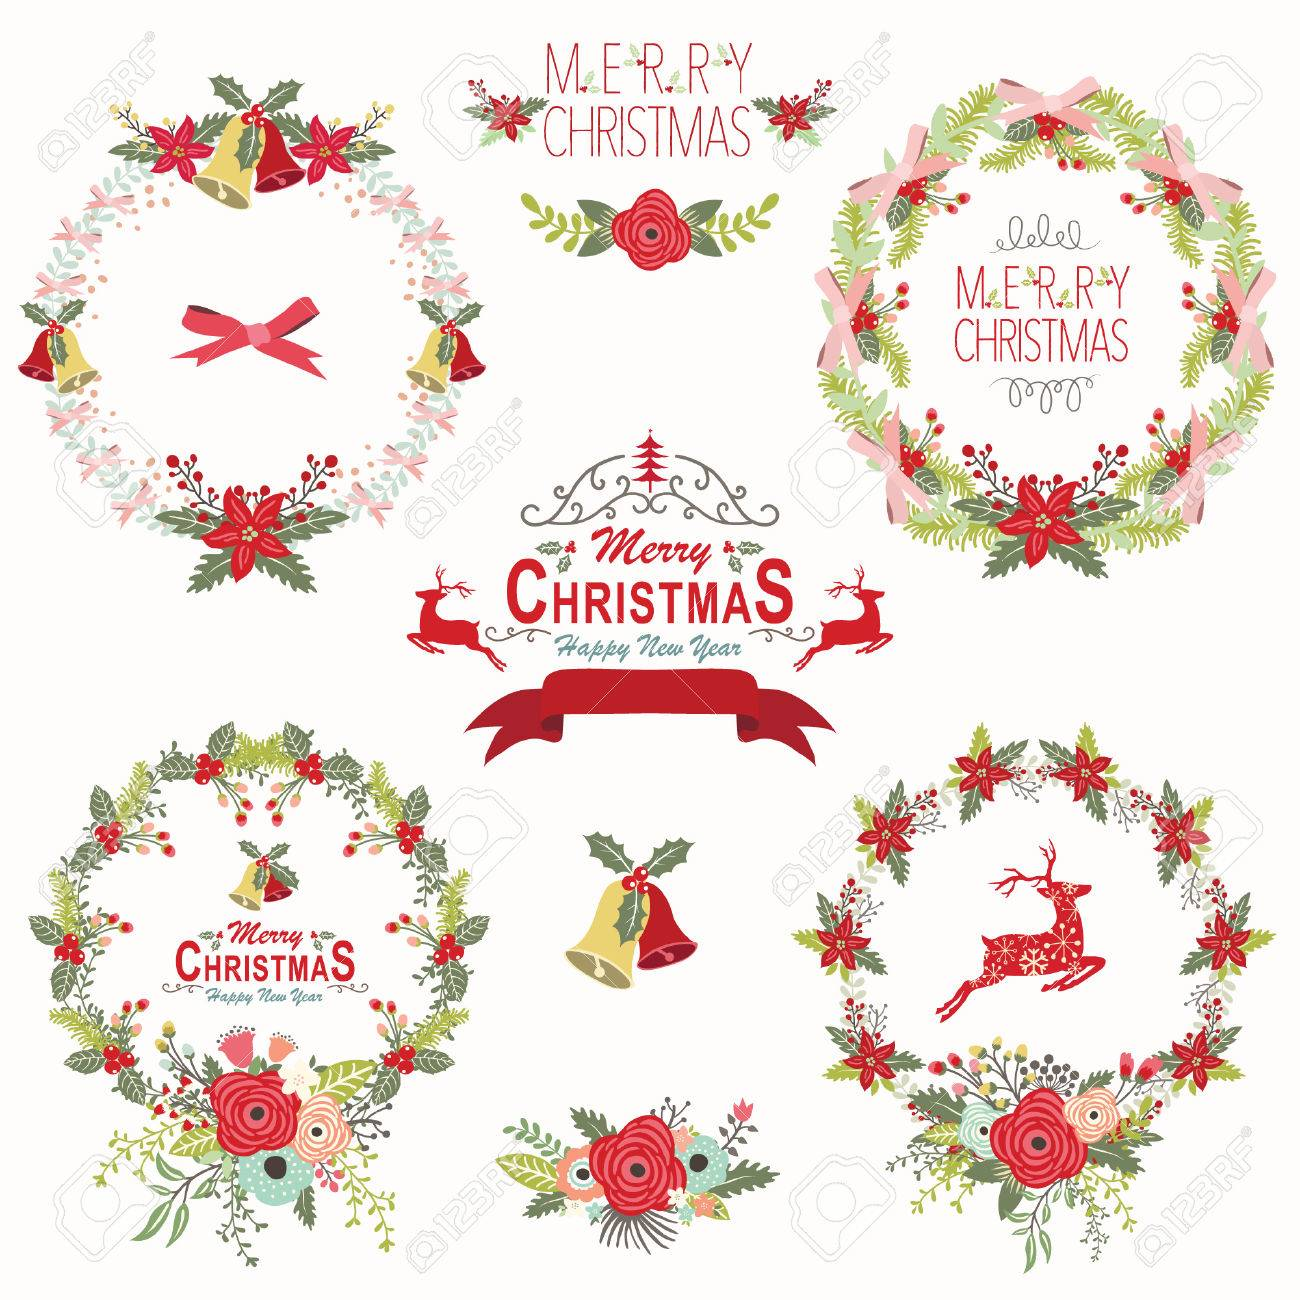 Retro Christmas Wreath Elements Stock Vector